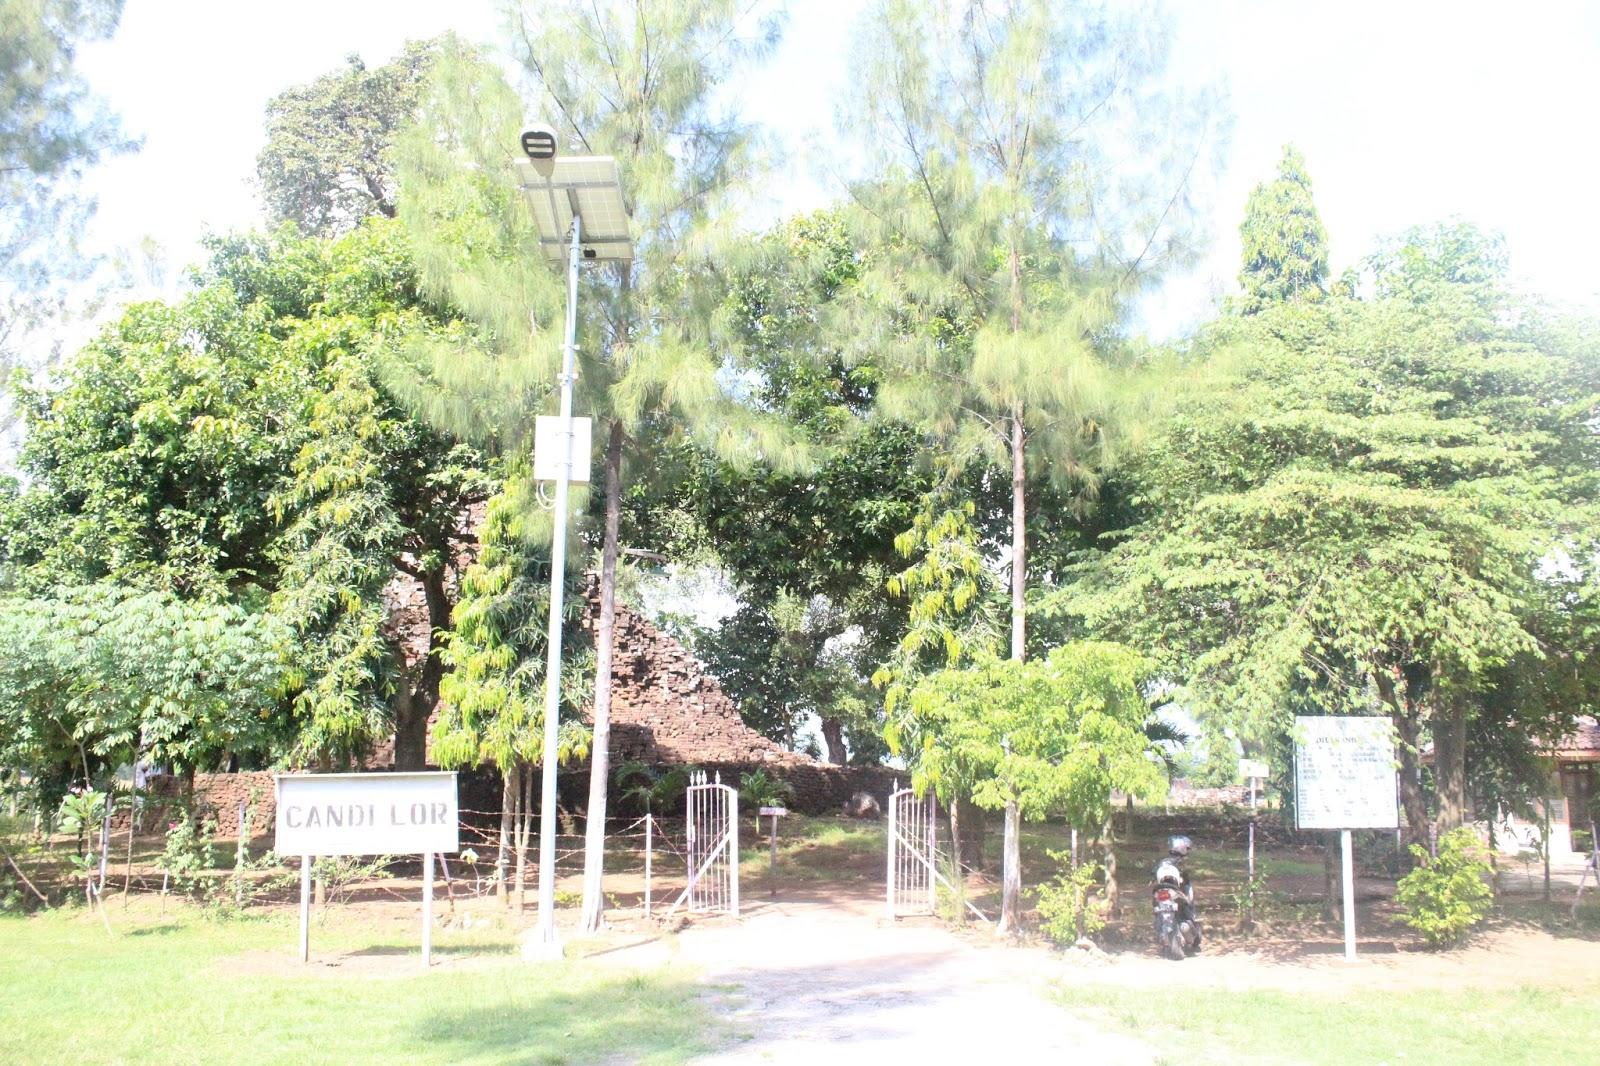 Candi Tertua Lor Kota Kabupaten Nganjuk Wisata Tempat Sejarah Pun